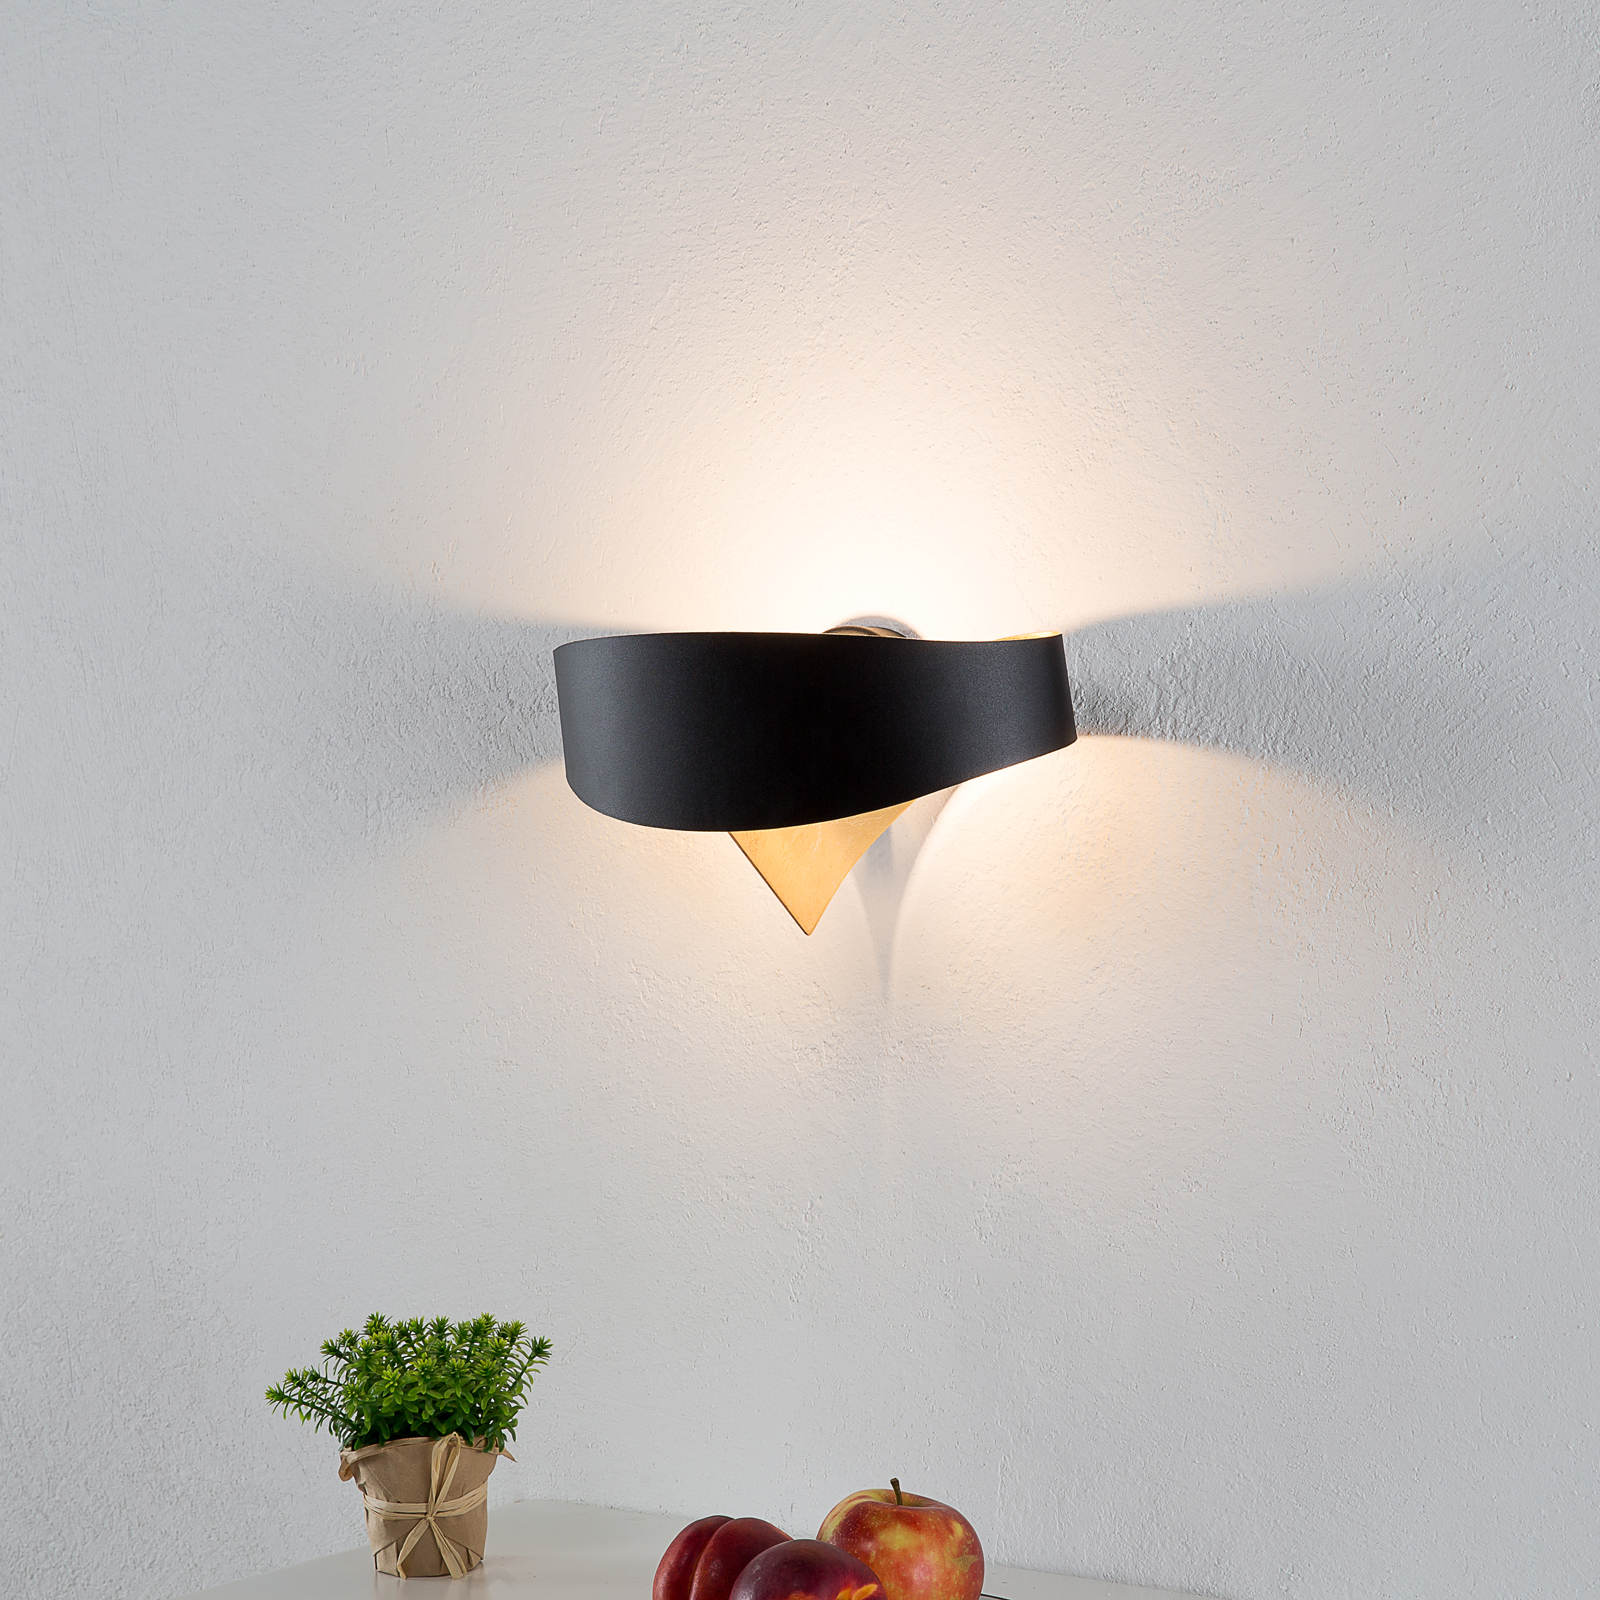 Zwart-gouden Designer wandlamp Scudo LED